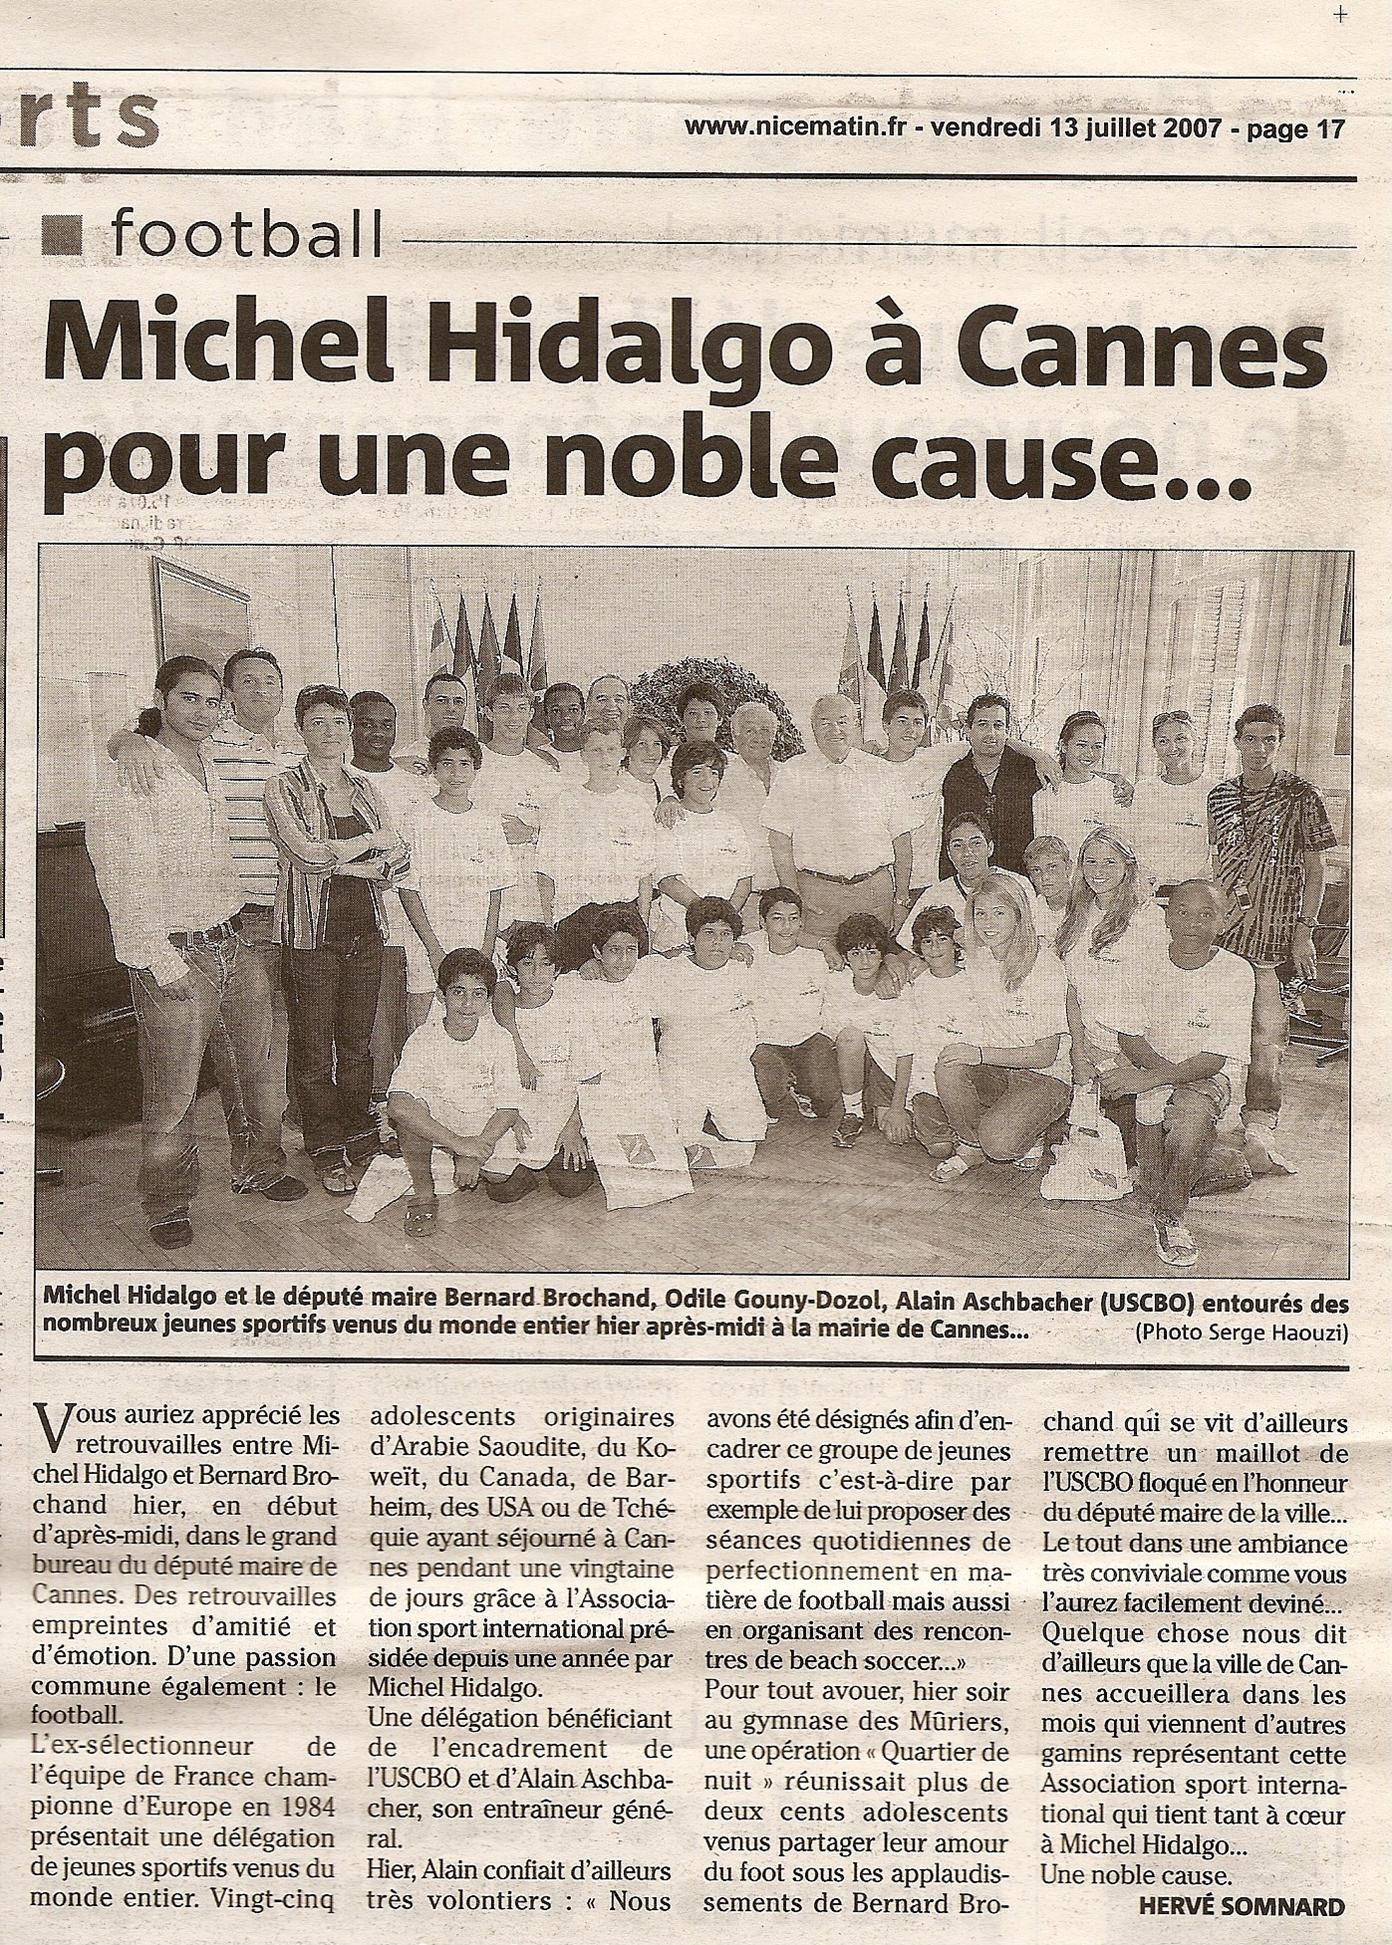 NICE MATIN 13-07-2007 L'USCBO et Michel HIDALGO